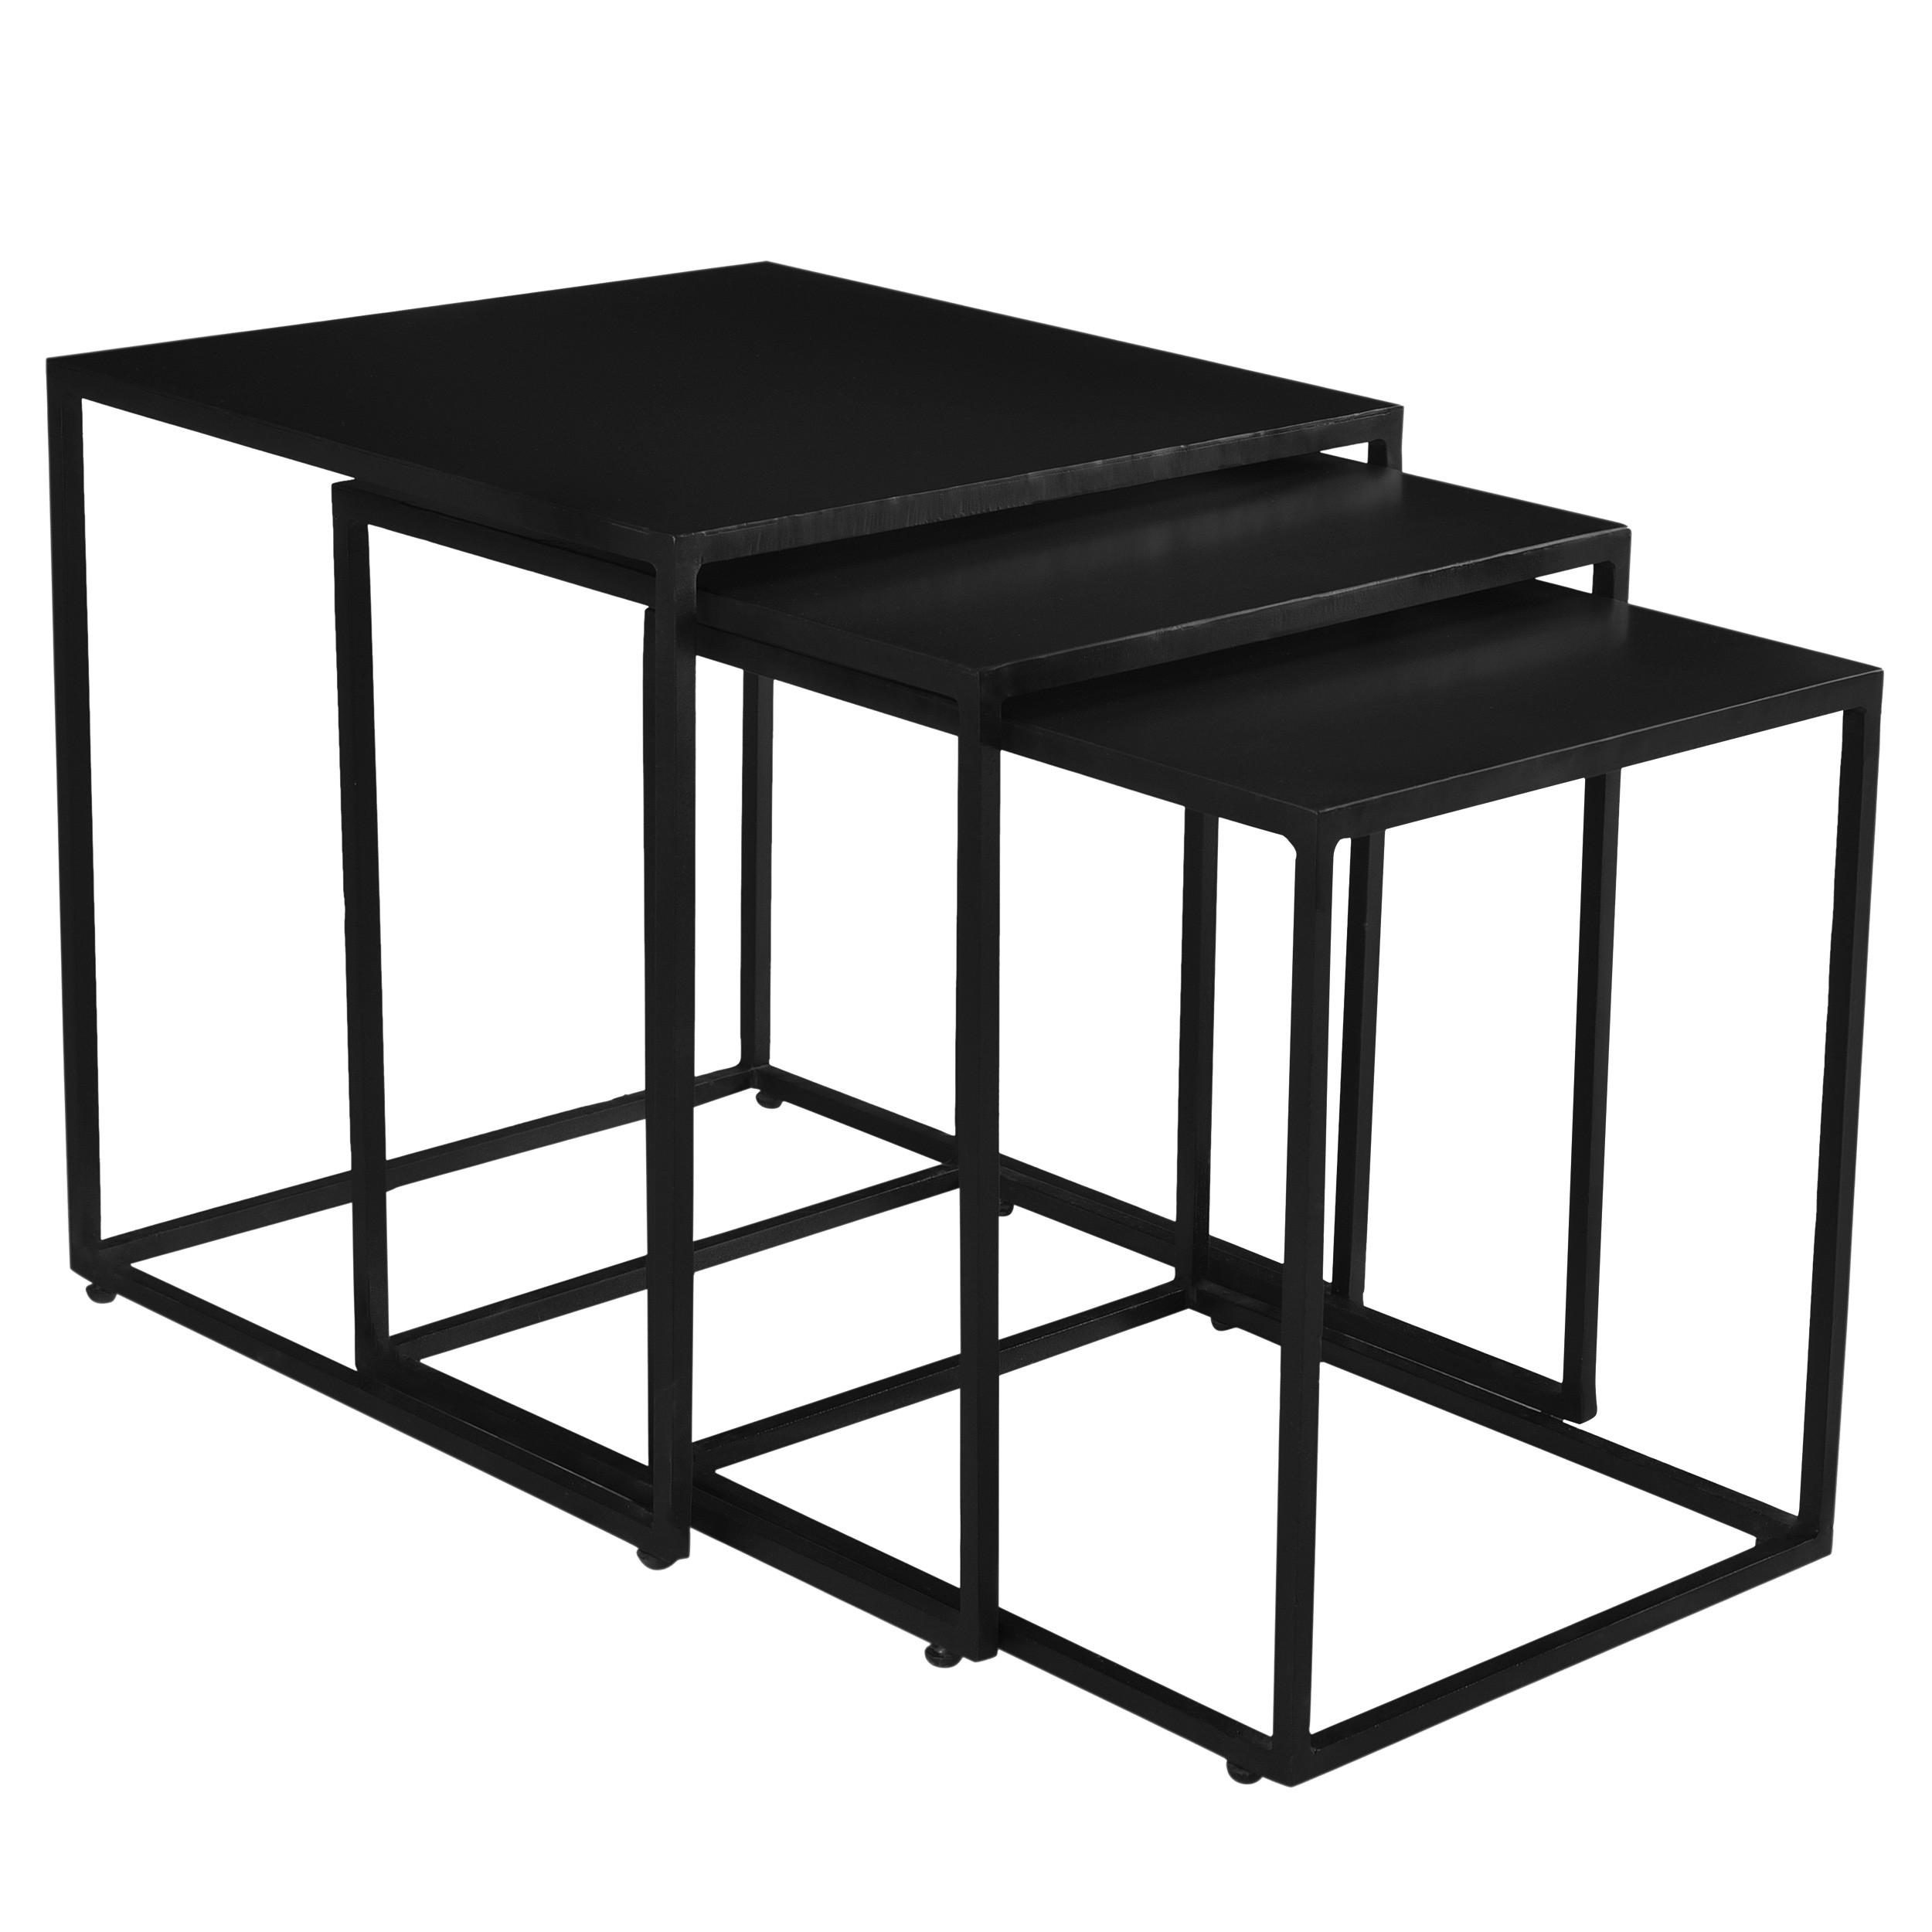 table basse gigogne leela carr e en m tal lot de 3 achetez nos tables basses gigognes leela. Black Bedroom Furniture Sets. Home Design Ideas